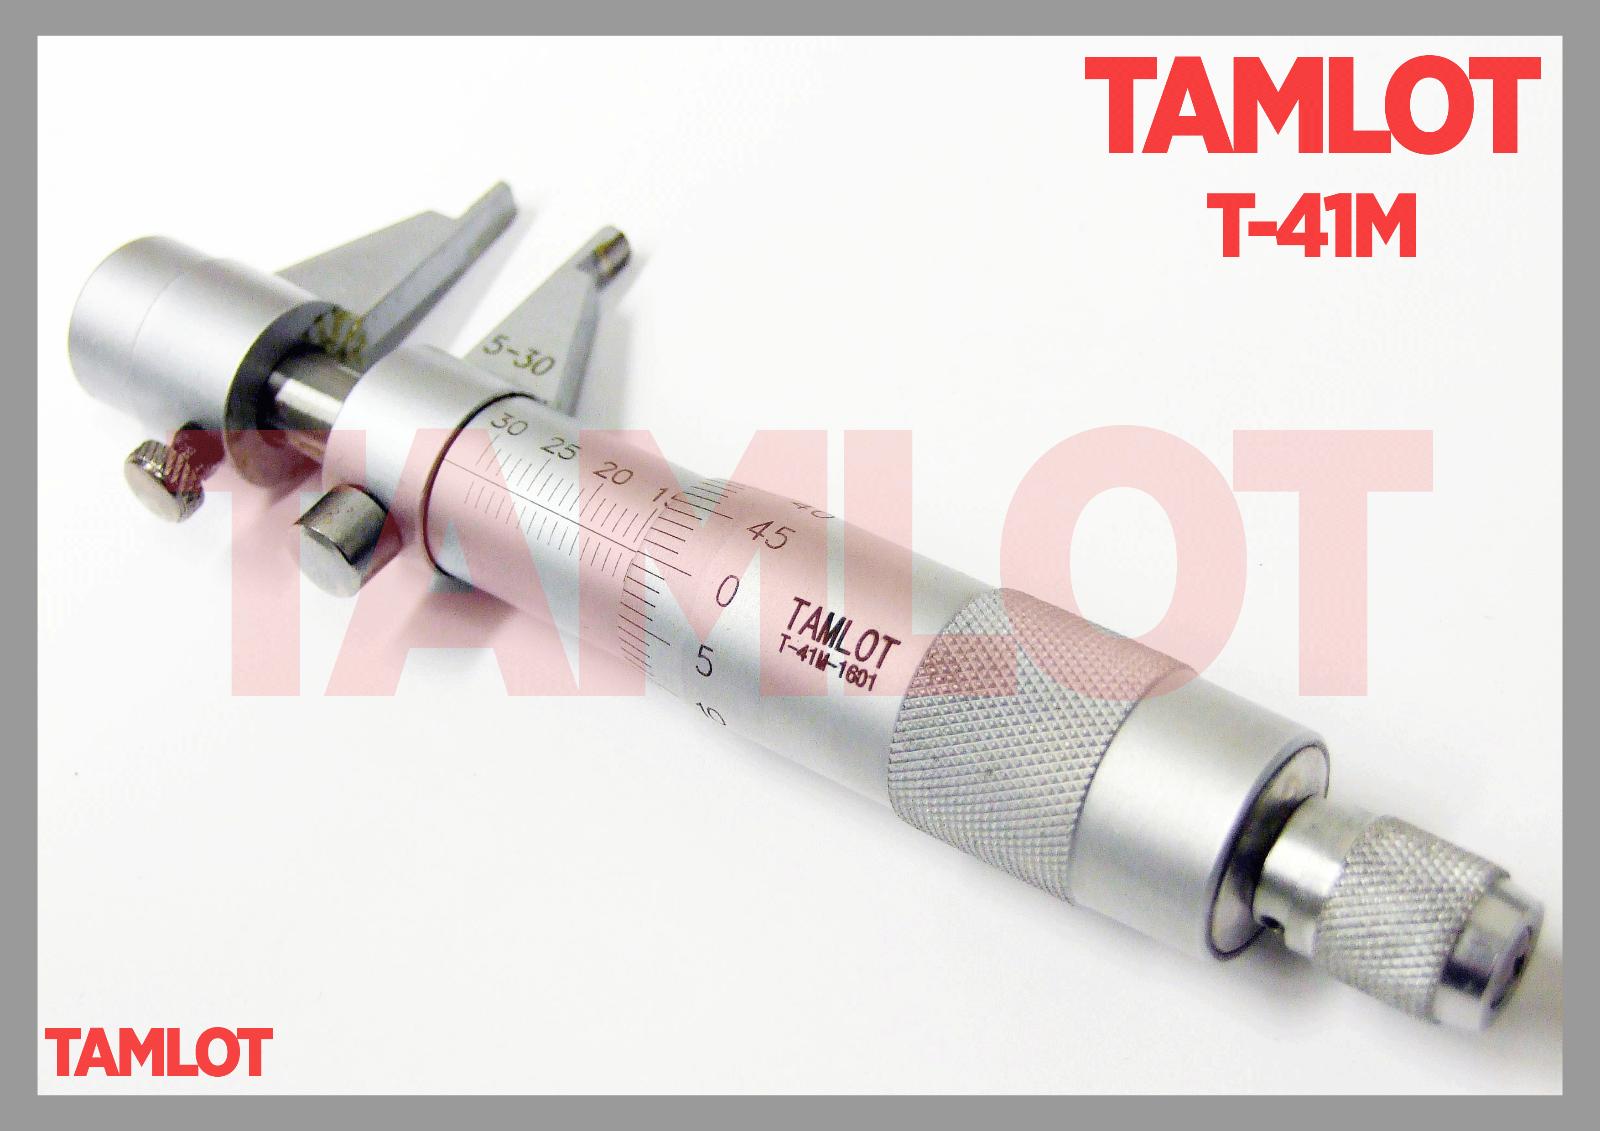 Innen- Messschraube Mikrometer TAMLOT T-41M gewölbte Messflächen 5-30 mm NEU OVP